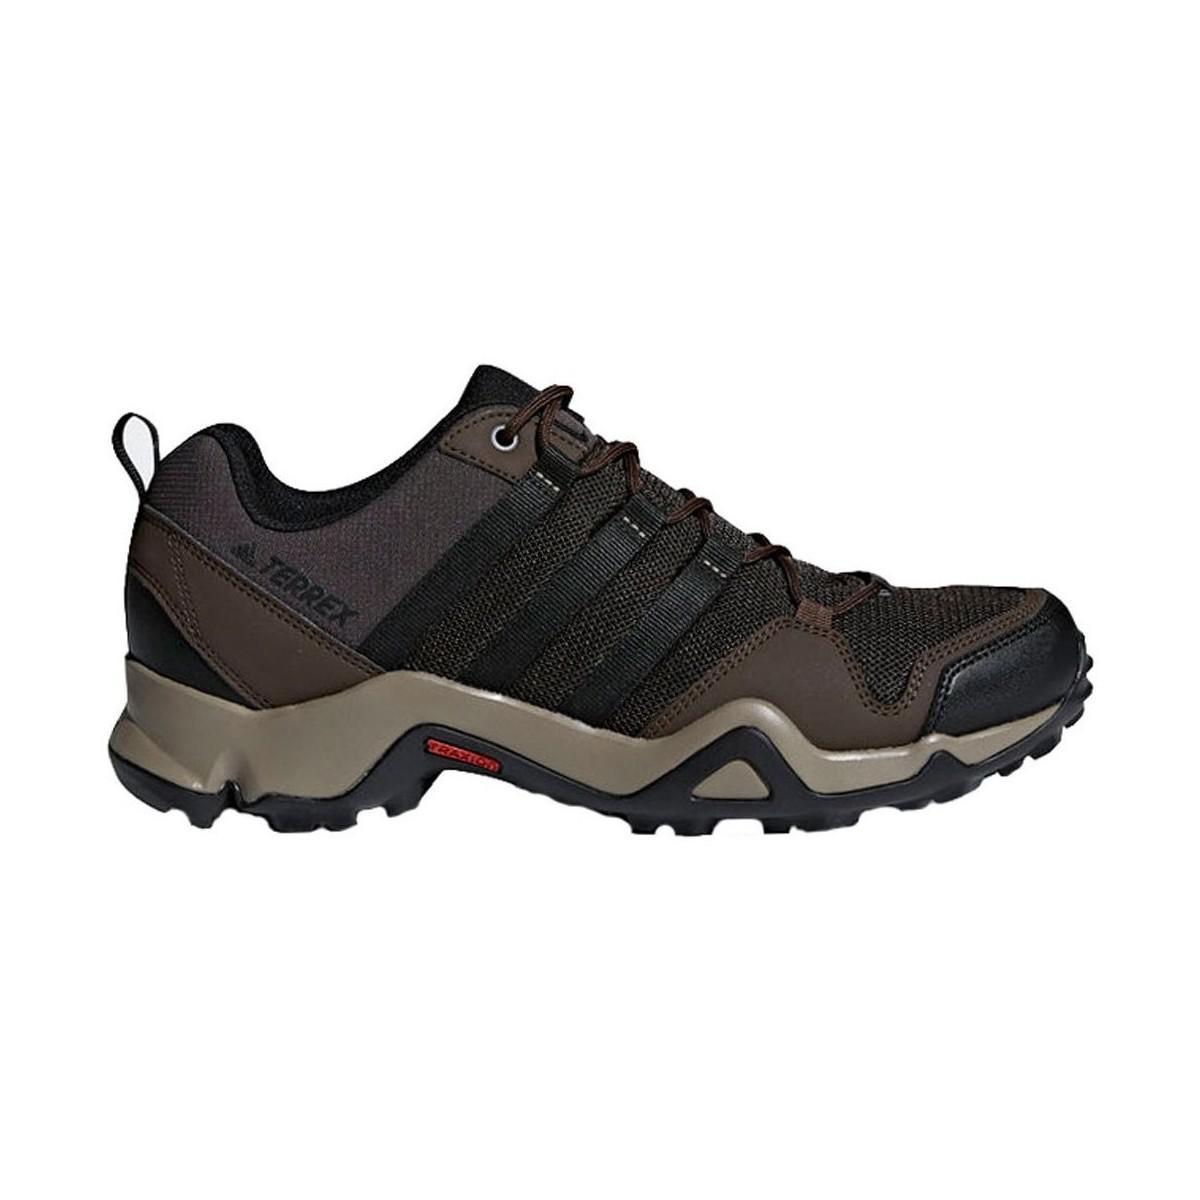 d6f1d956fb68 Adidas Terrex Ax2r Men s Walking Boots In Black in Black for Men - Lyst